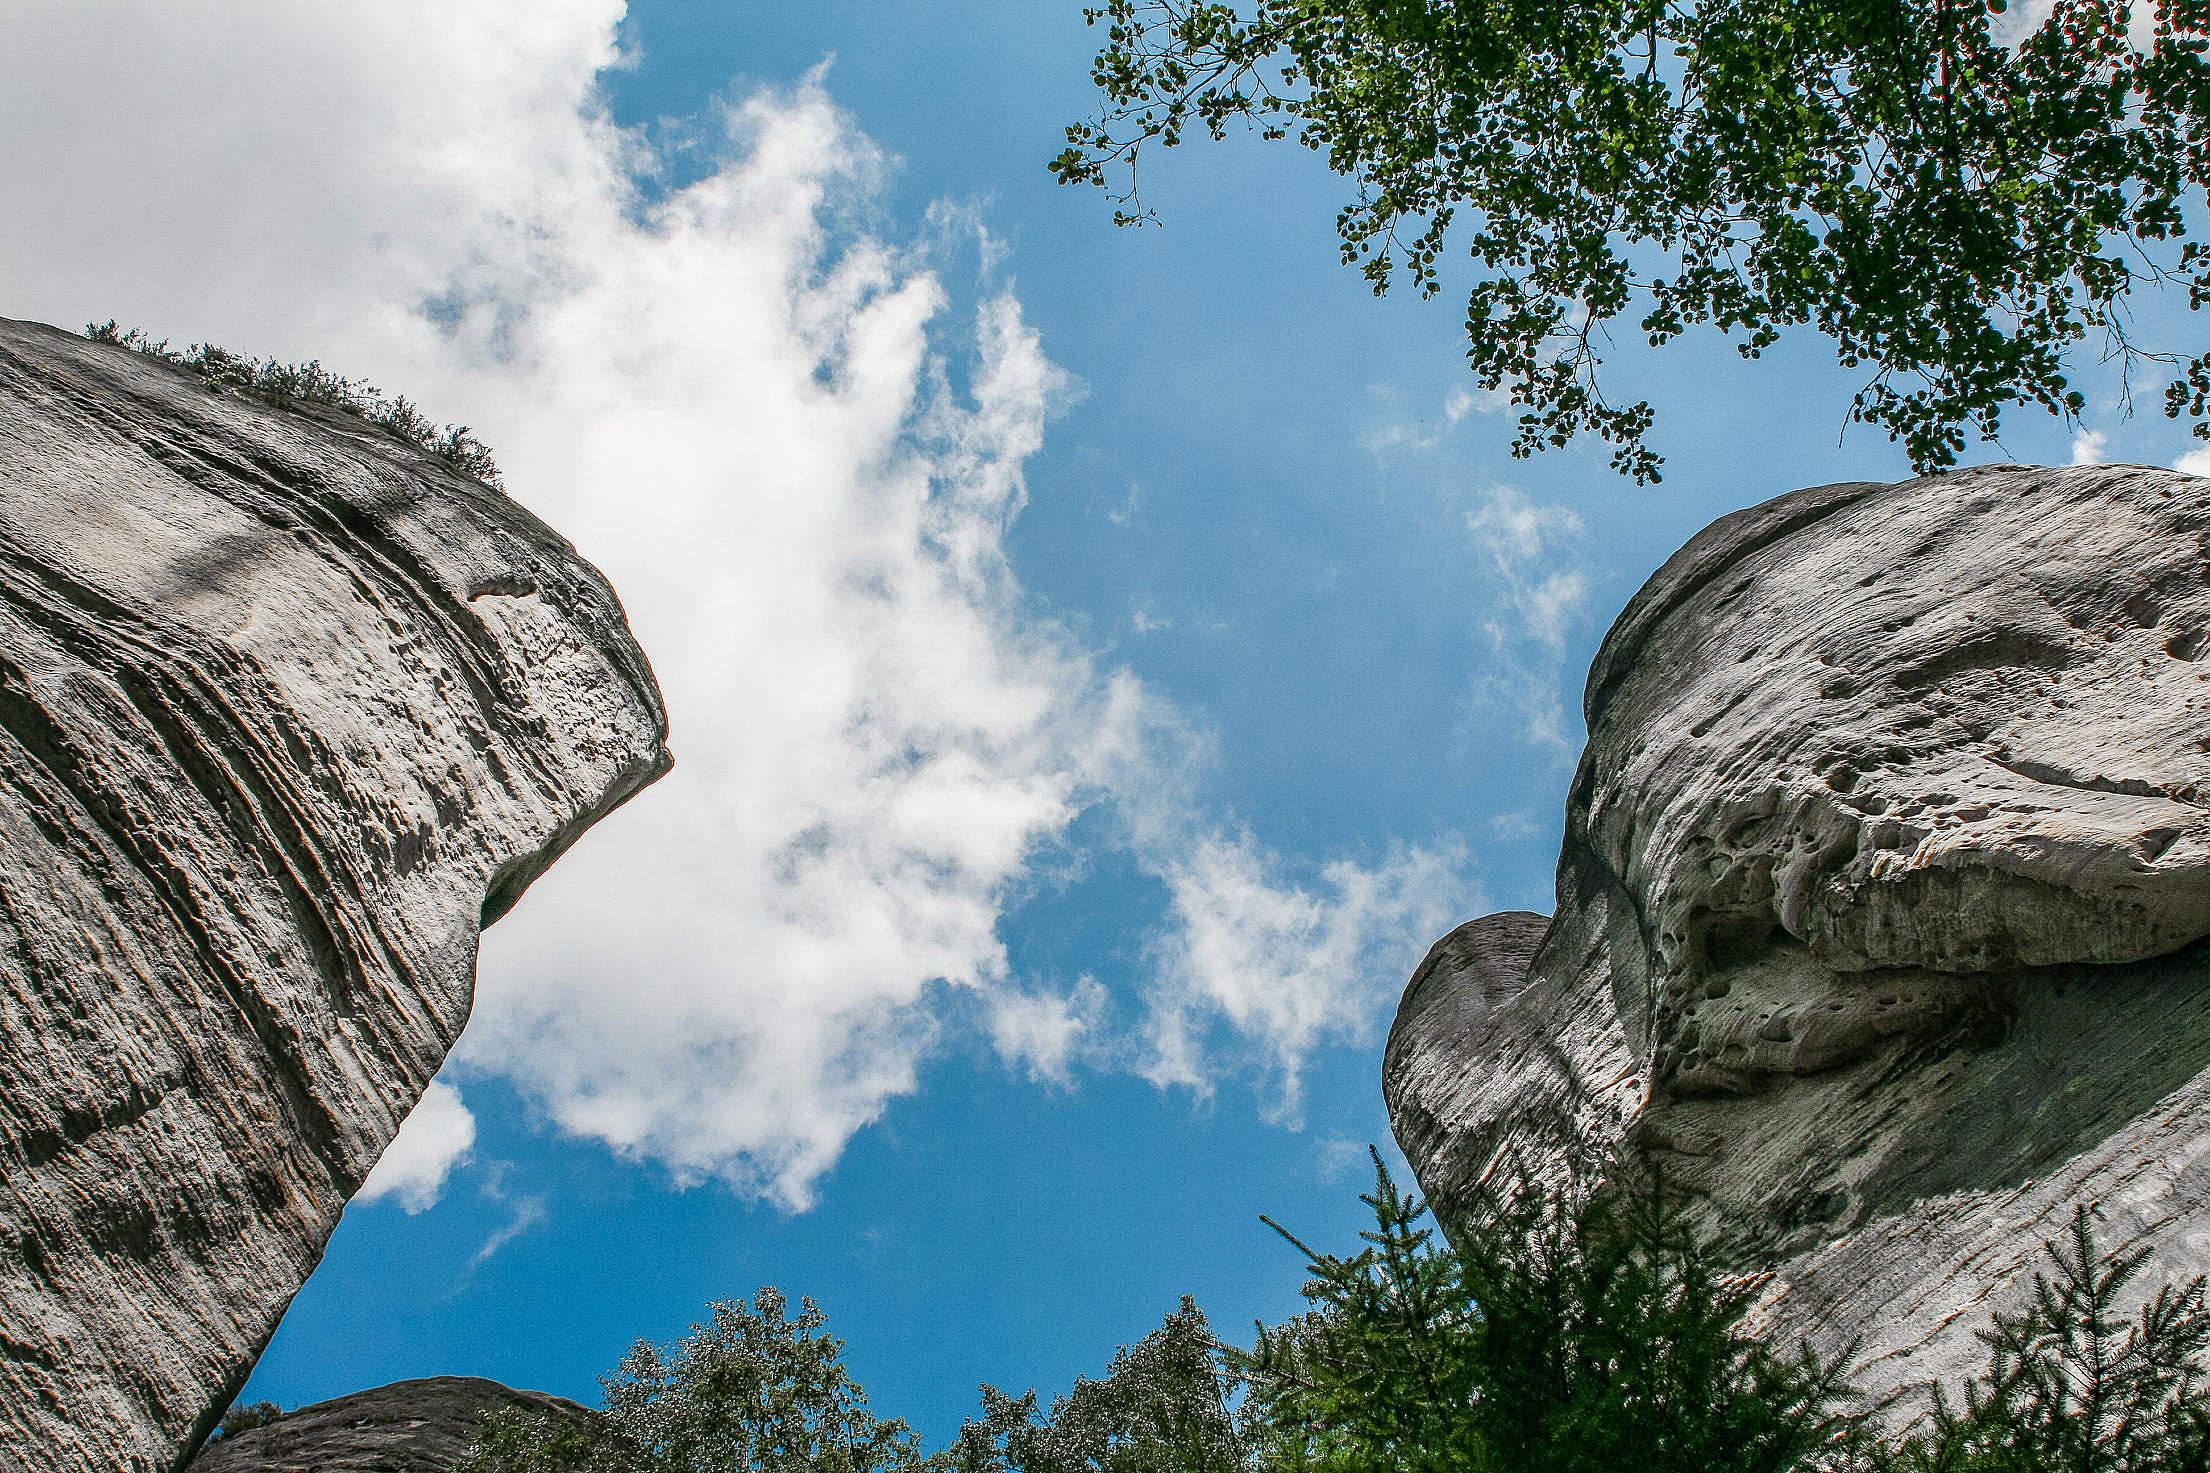 The Sky Through Adršpach-Teplice Rocks Free Stock Photo